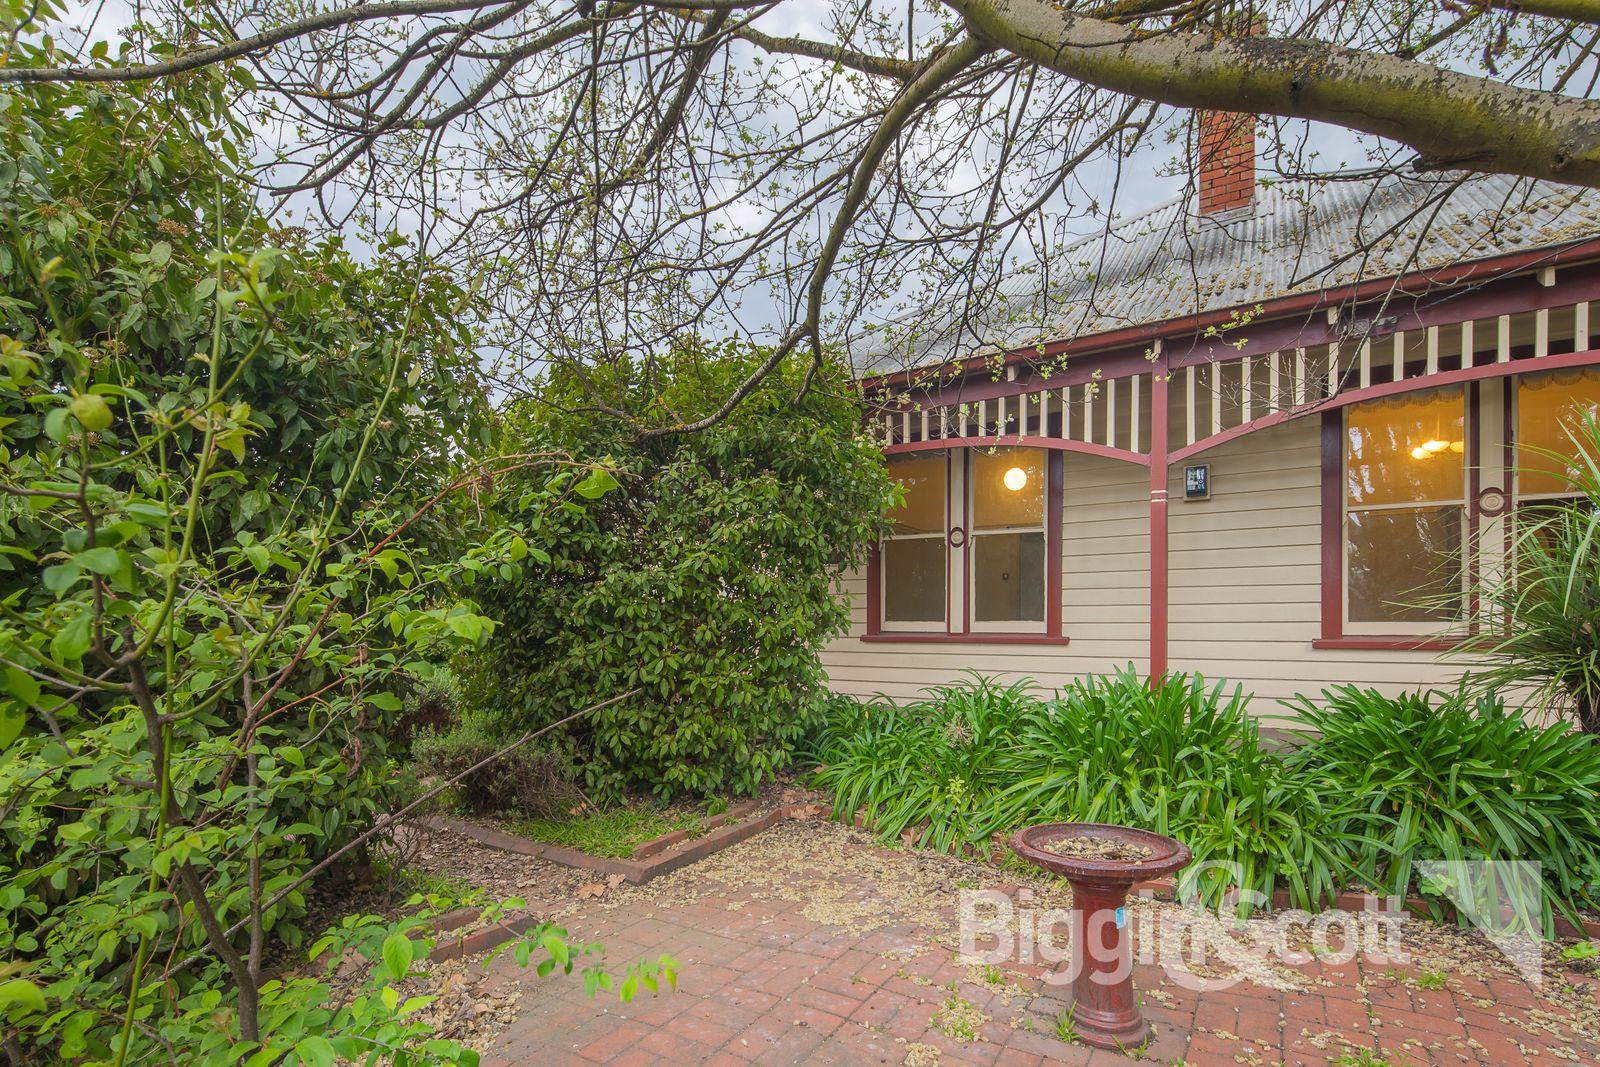 11 Church Street, Ballarat Central VIC 3350, Image 0